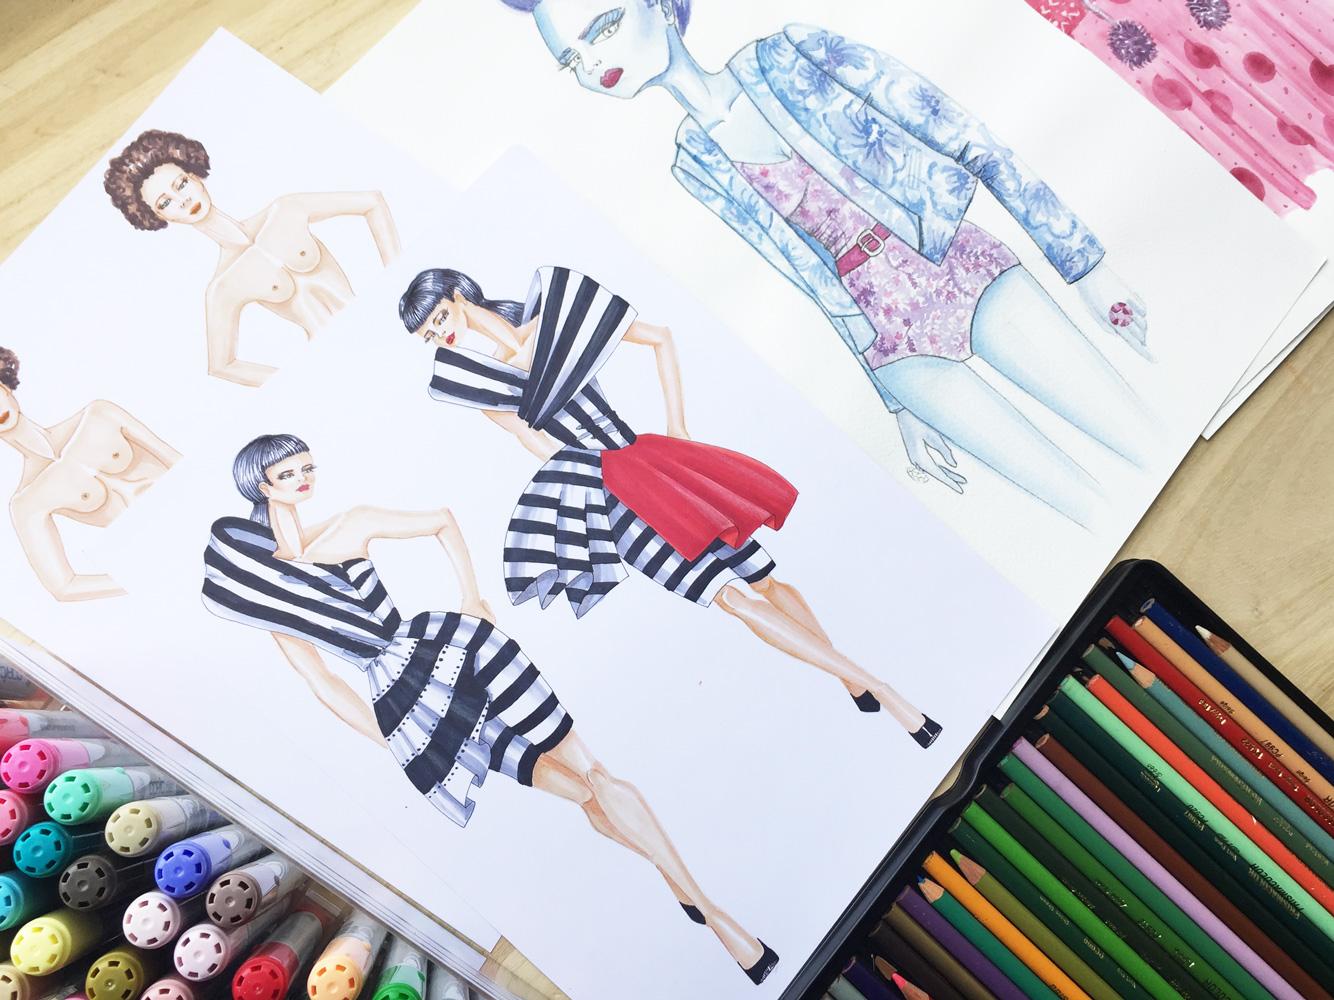 Papeles Para Dibujar Figurines De Moda Cuáles Usar Según La Técnica